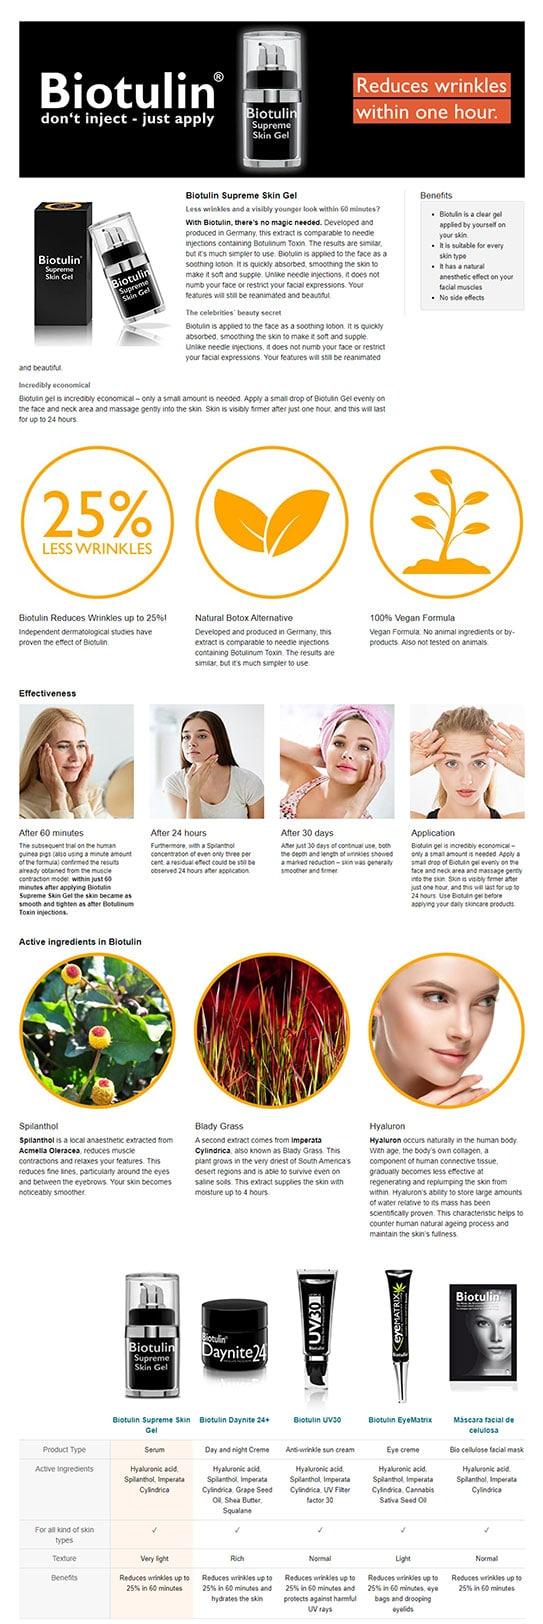 screencapture amazon BIOTULIN Supreme Reduces Wrinkles Treatment dp B00TOGEGCY ref sr 1 5 2021 07 08 15scdd 35 50 1